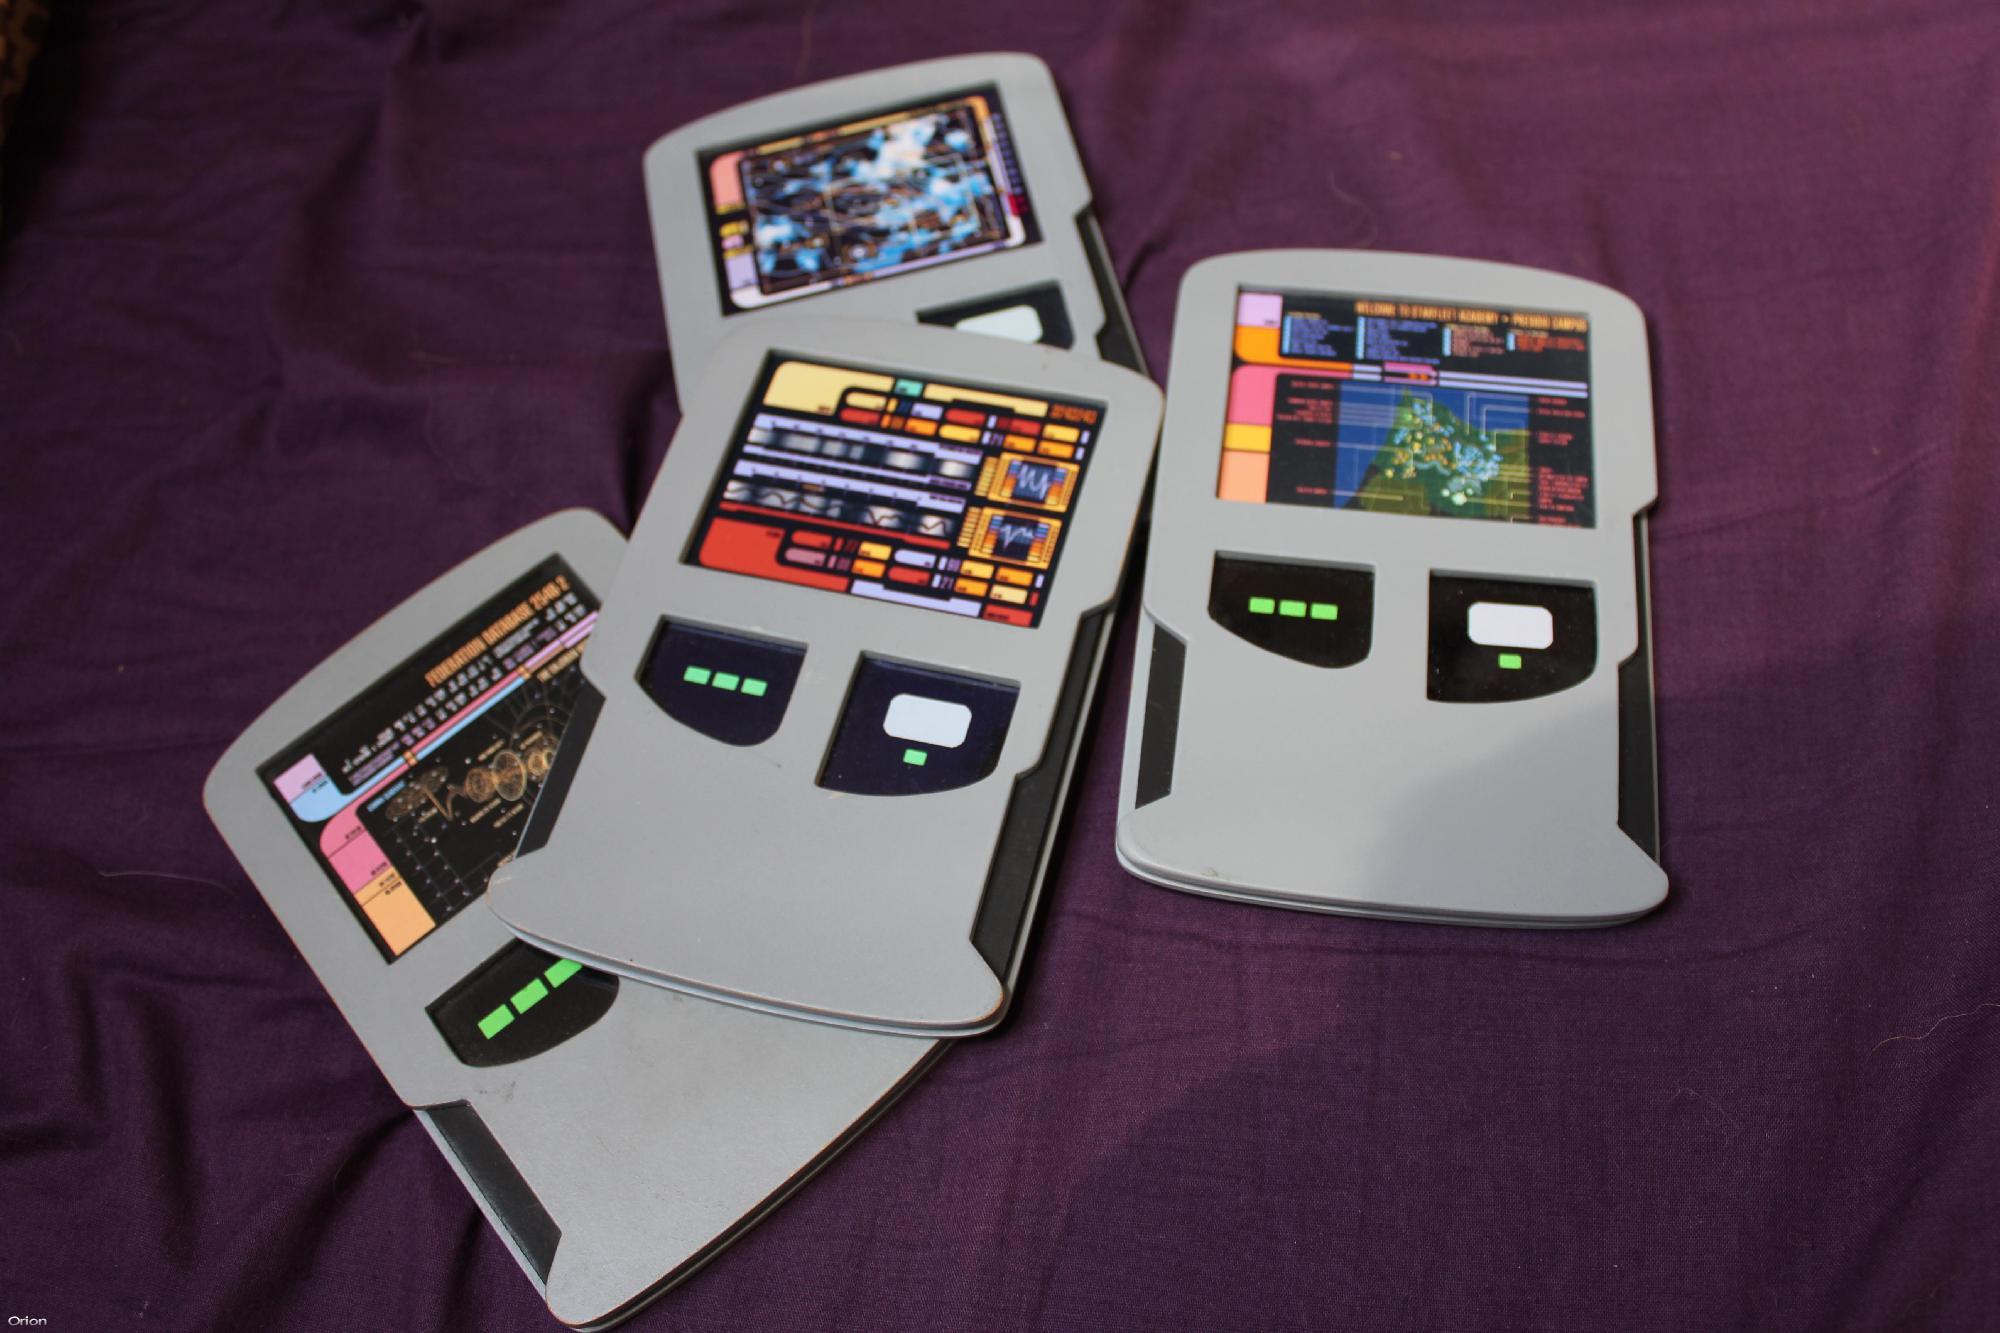 starfleet academy tablets